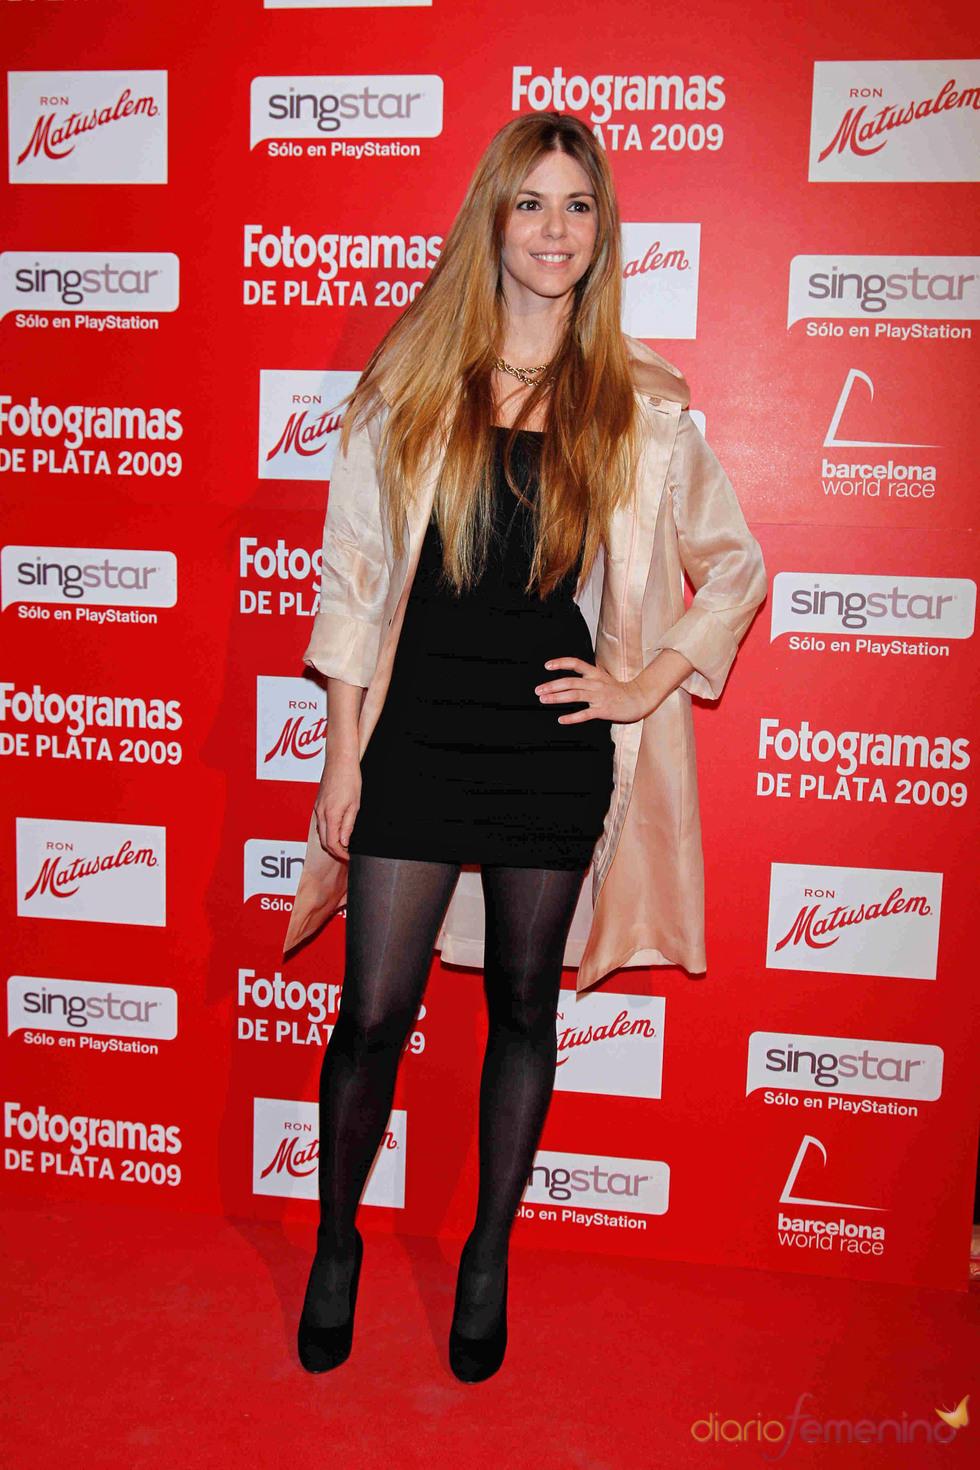 Fotogramas de Plata 2009: Manuela Velasco